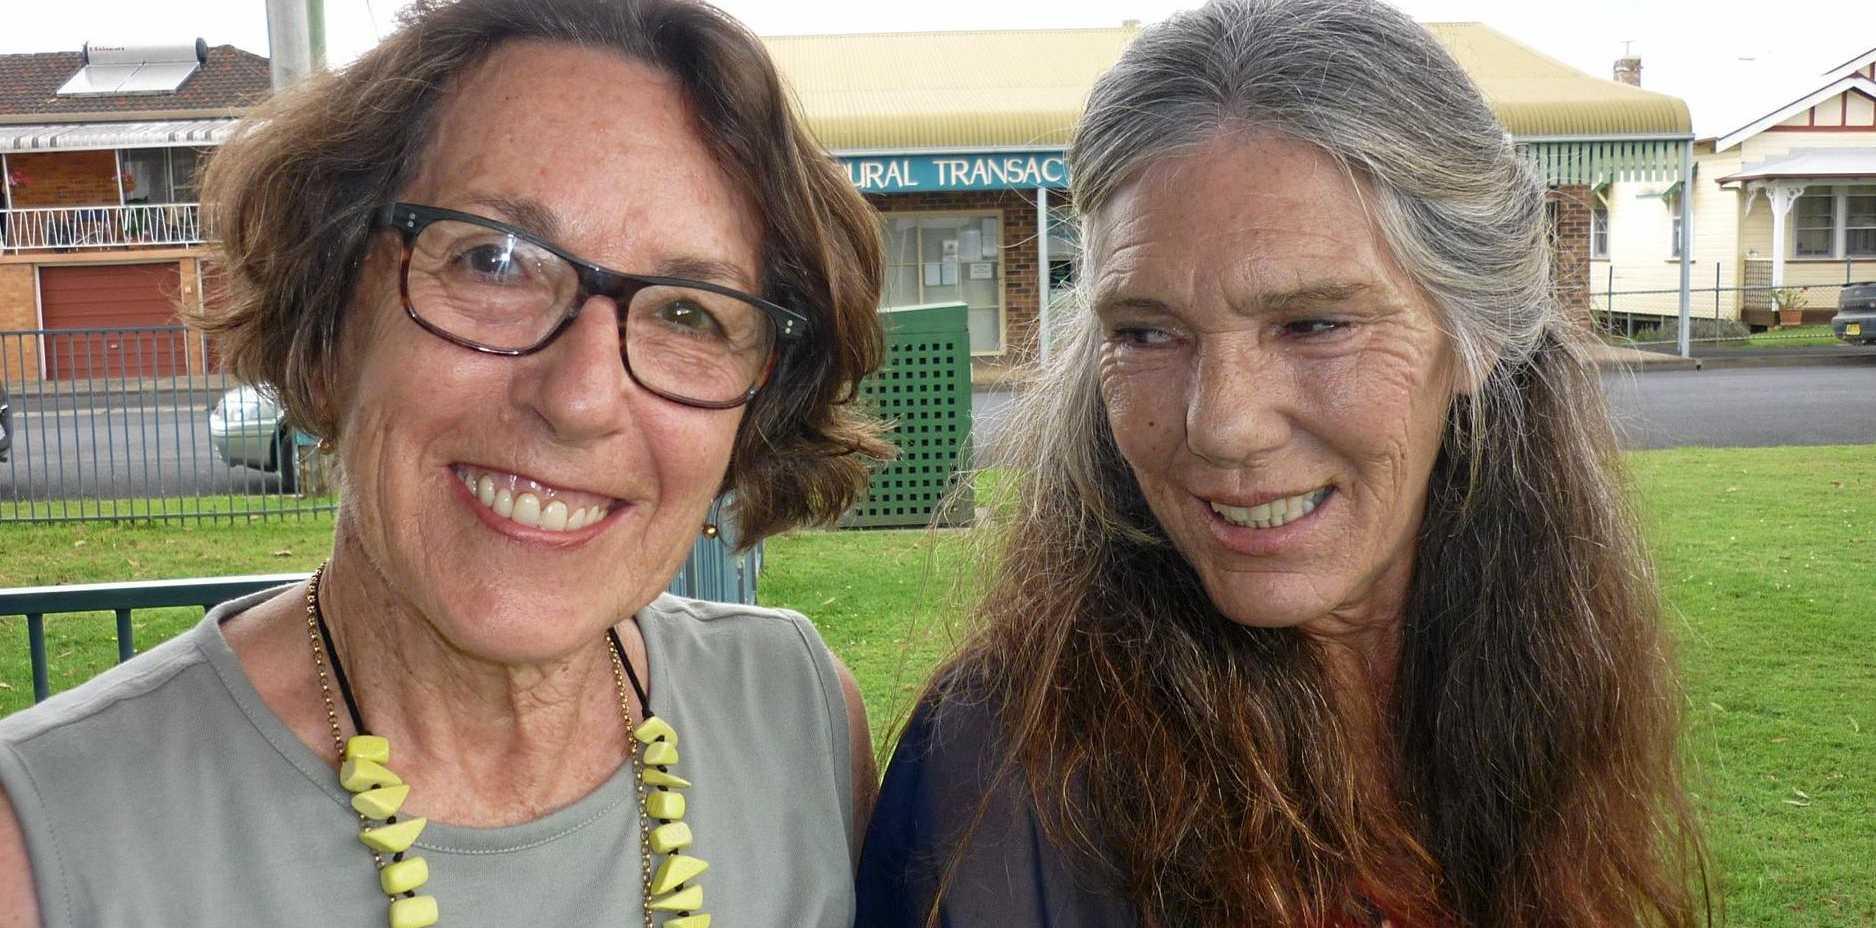 NOMINATE: Paula Starkey and Rikki Toi, of Coraki, were named Hidden Treasures in 2015 for their volunteering work.